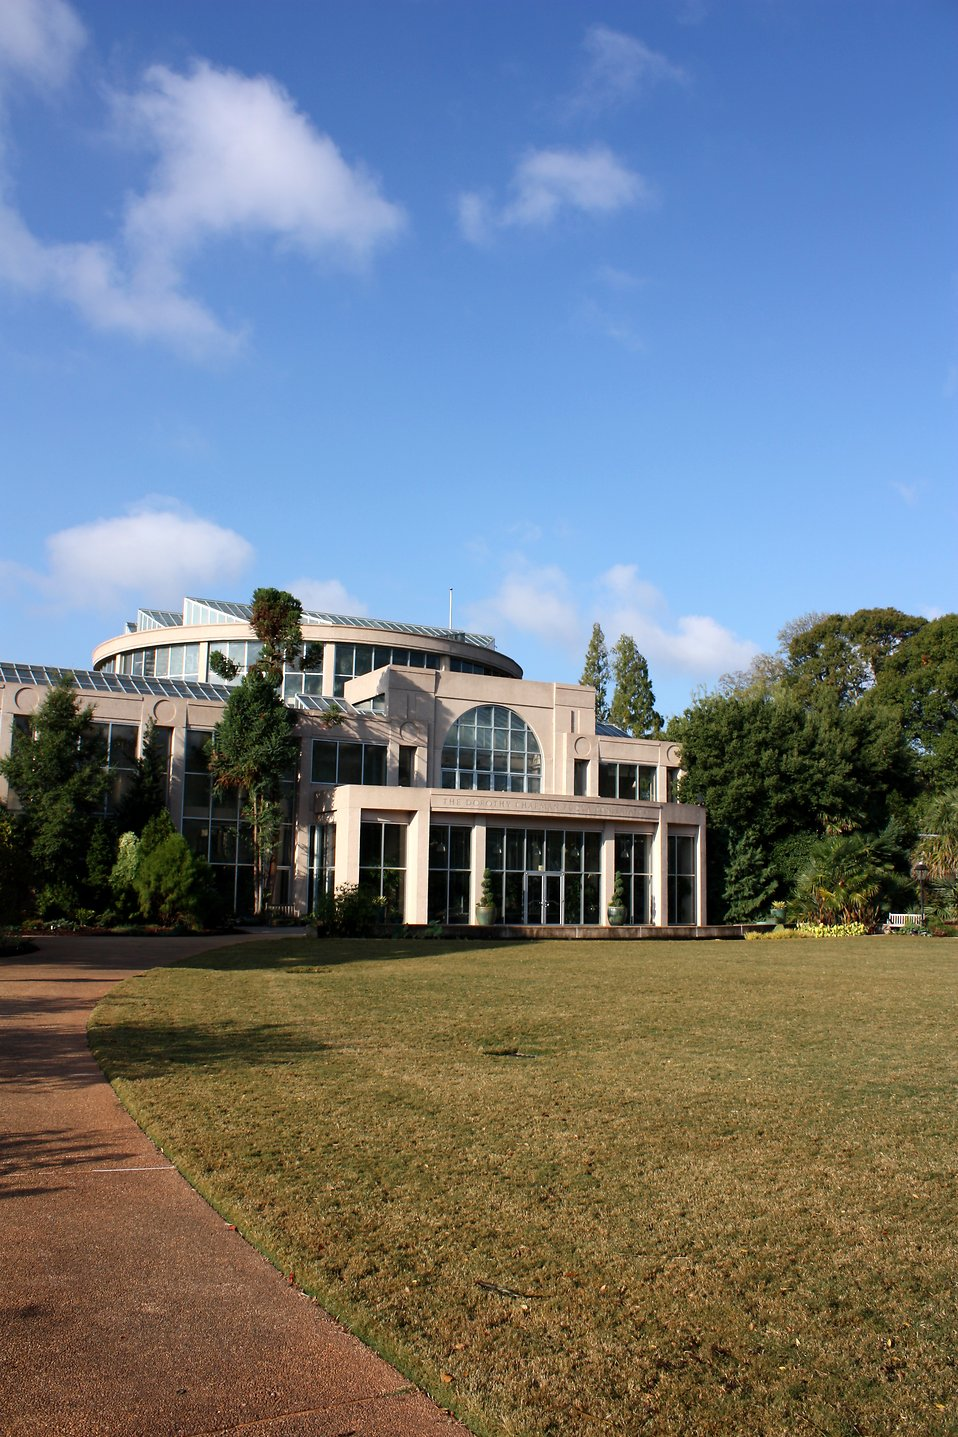 The Dorothy Chapman Fuqua Conservatory at the Atlanta Botanical Garden in Atlanta, Georgia : Free Stock Photo